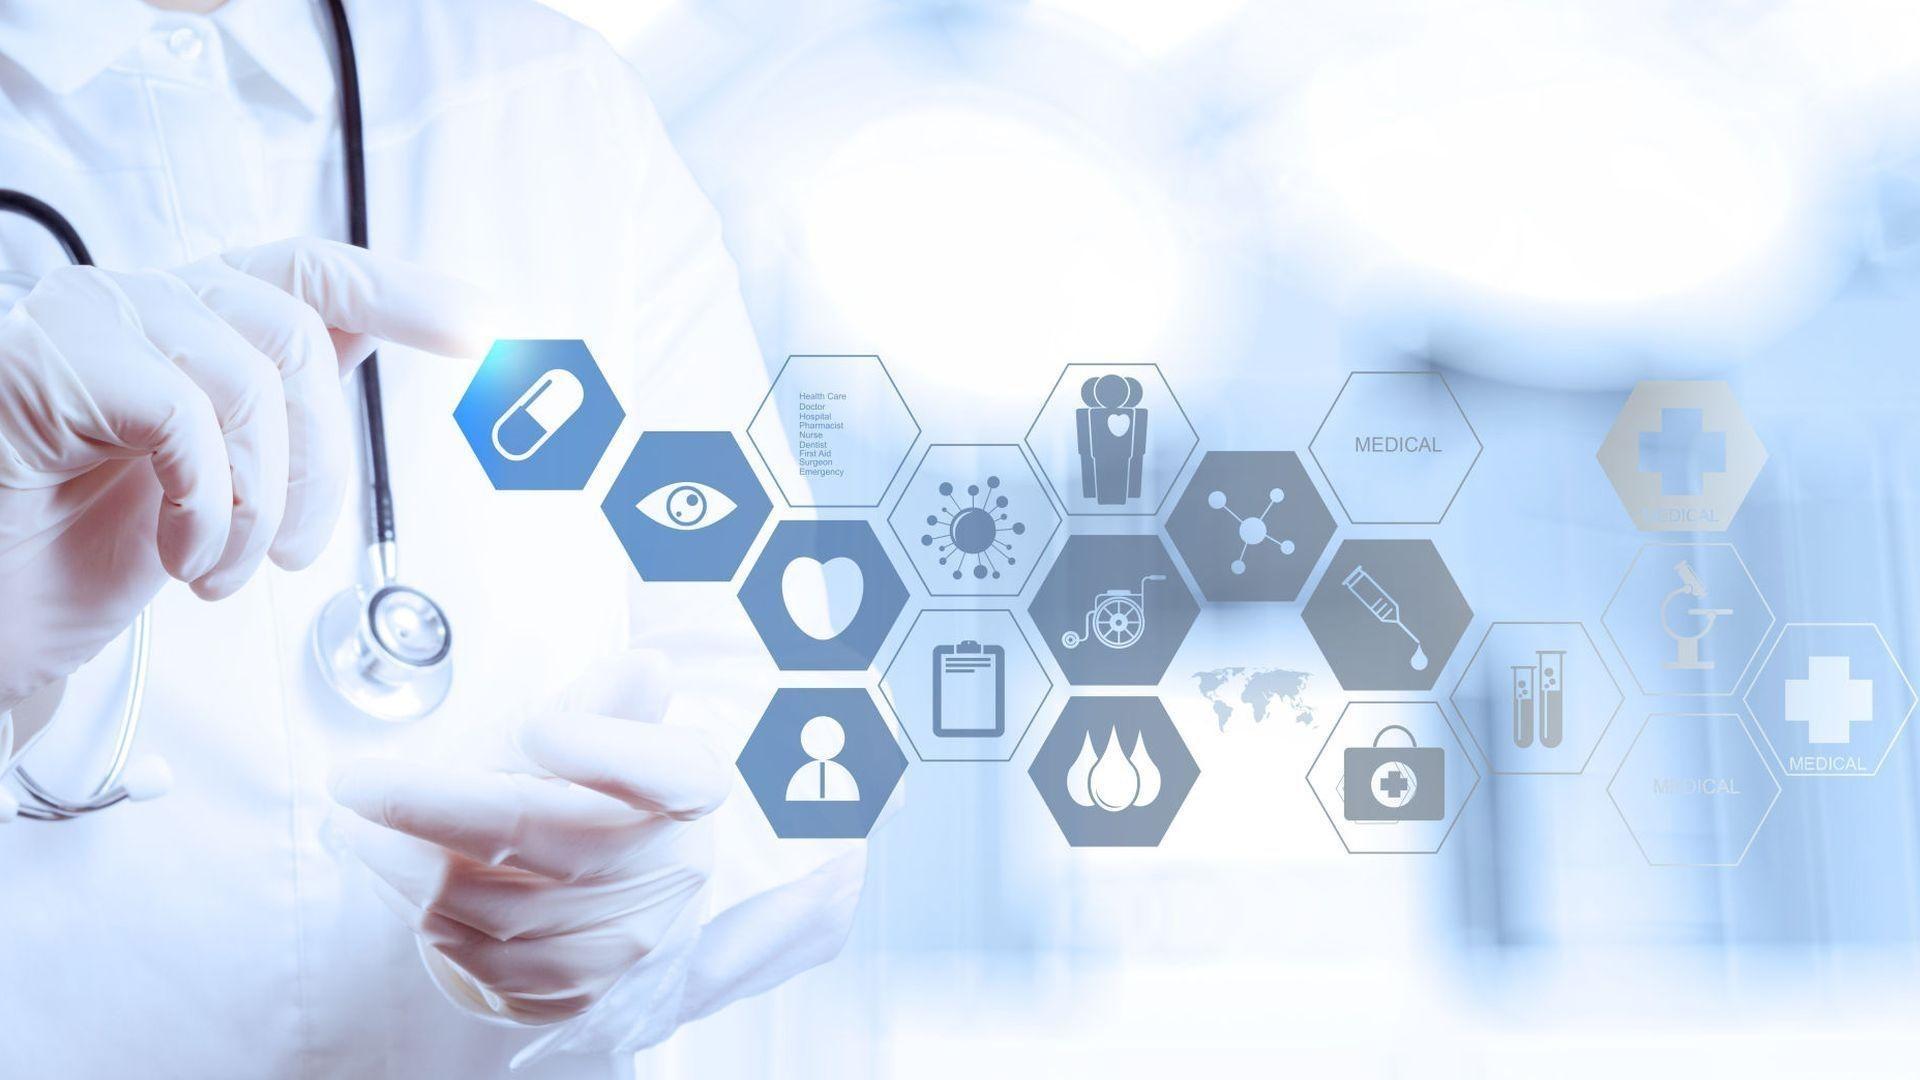 Medical Wallpaper image hd